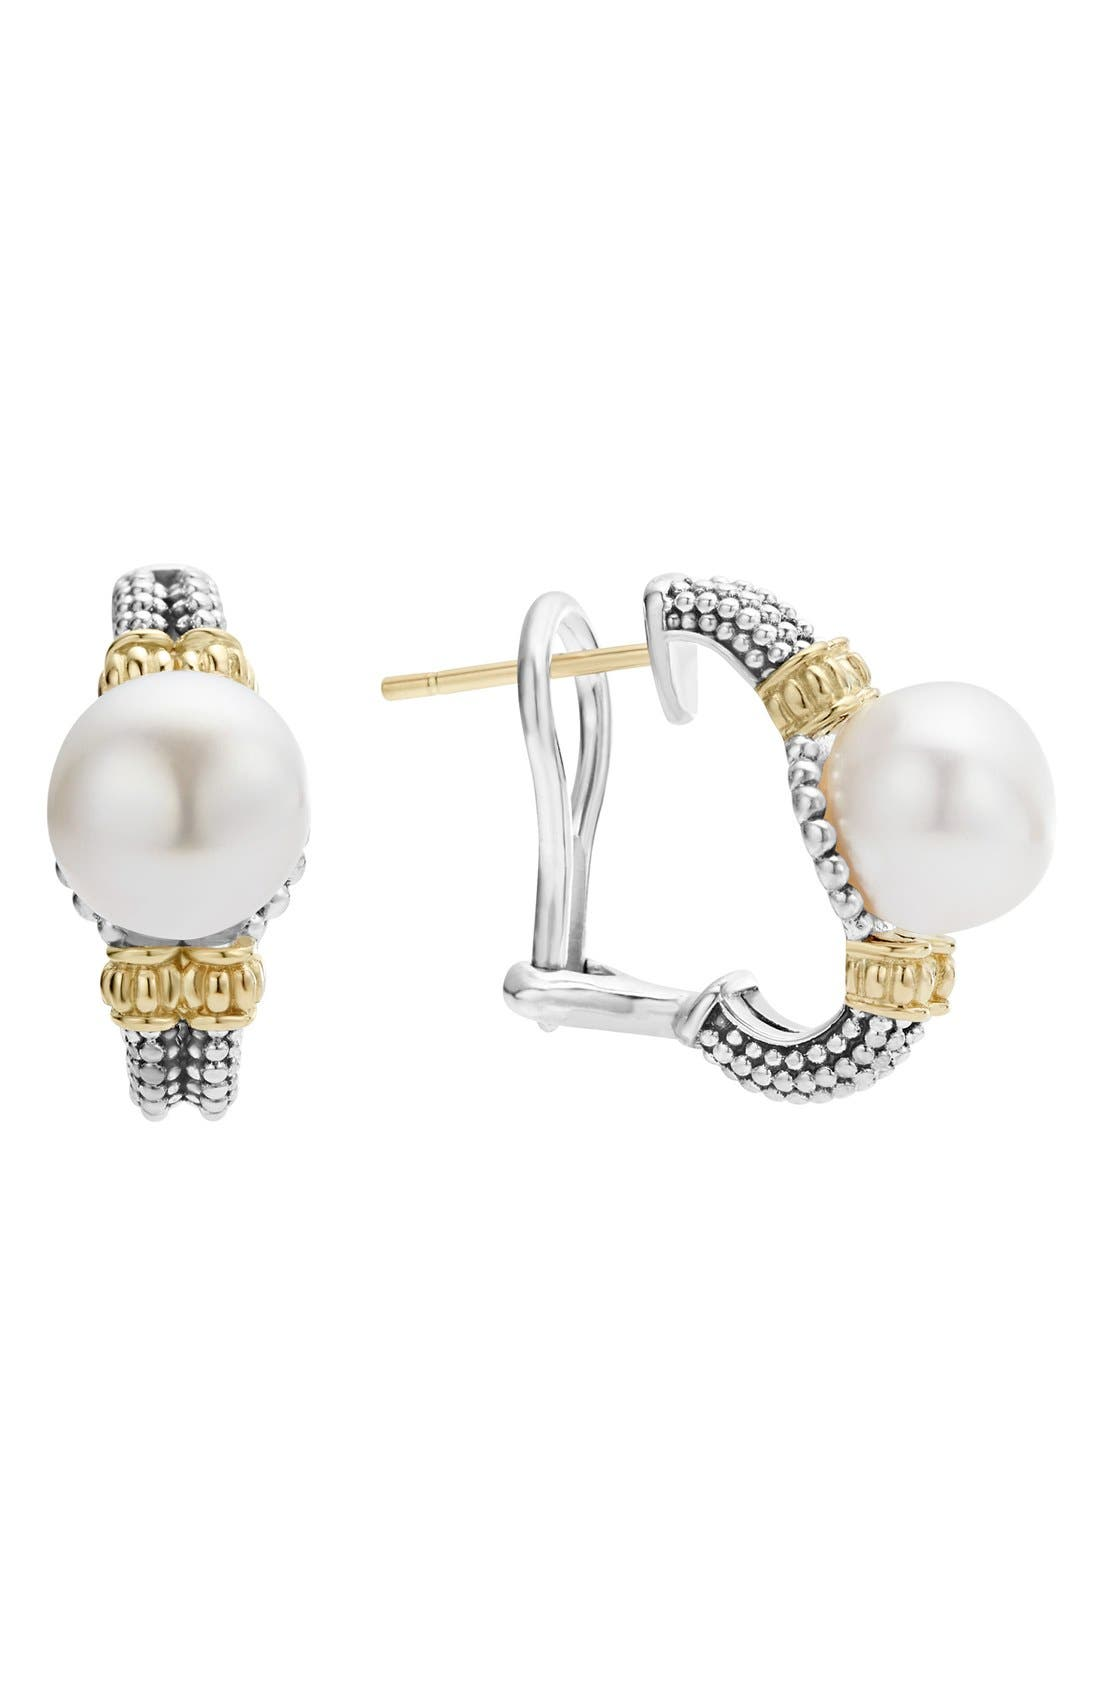 Luna Pearl Stud Earrings,                         Main,                         color, Silver/ Pearl